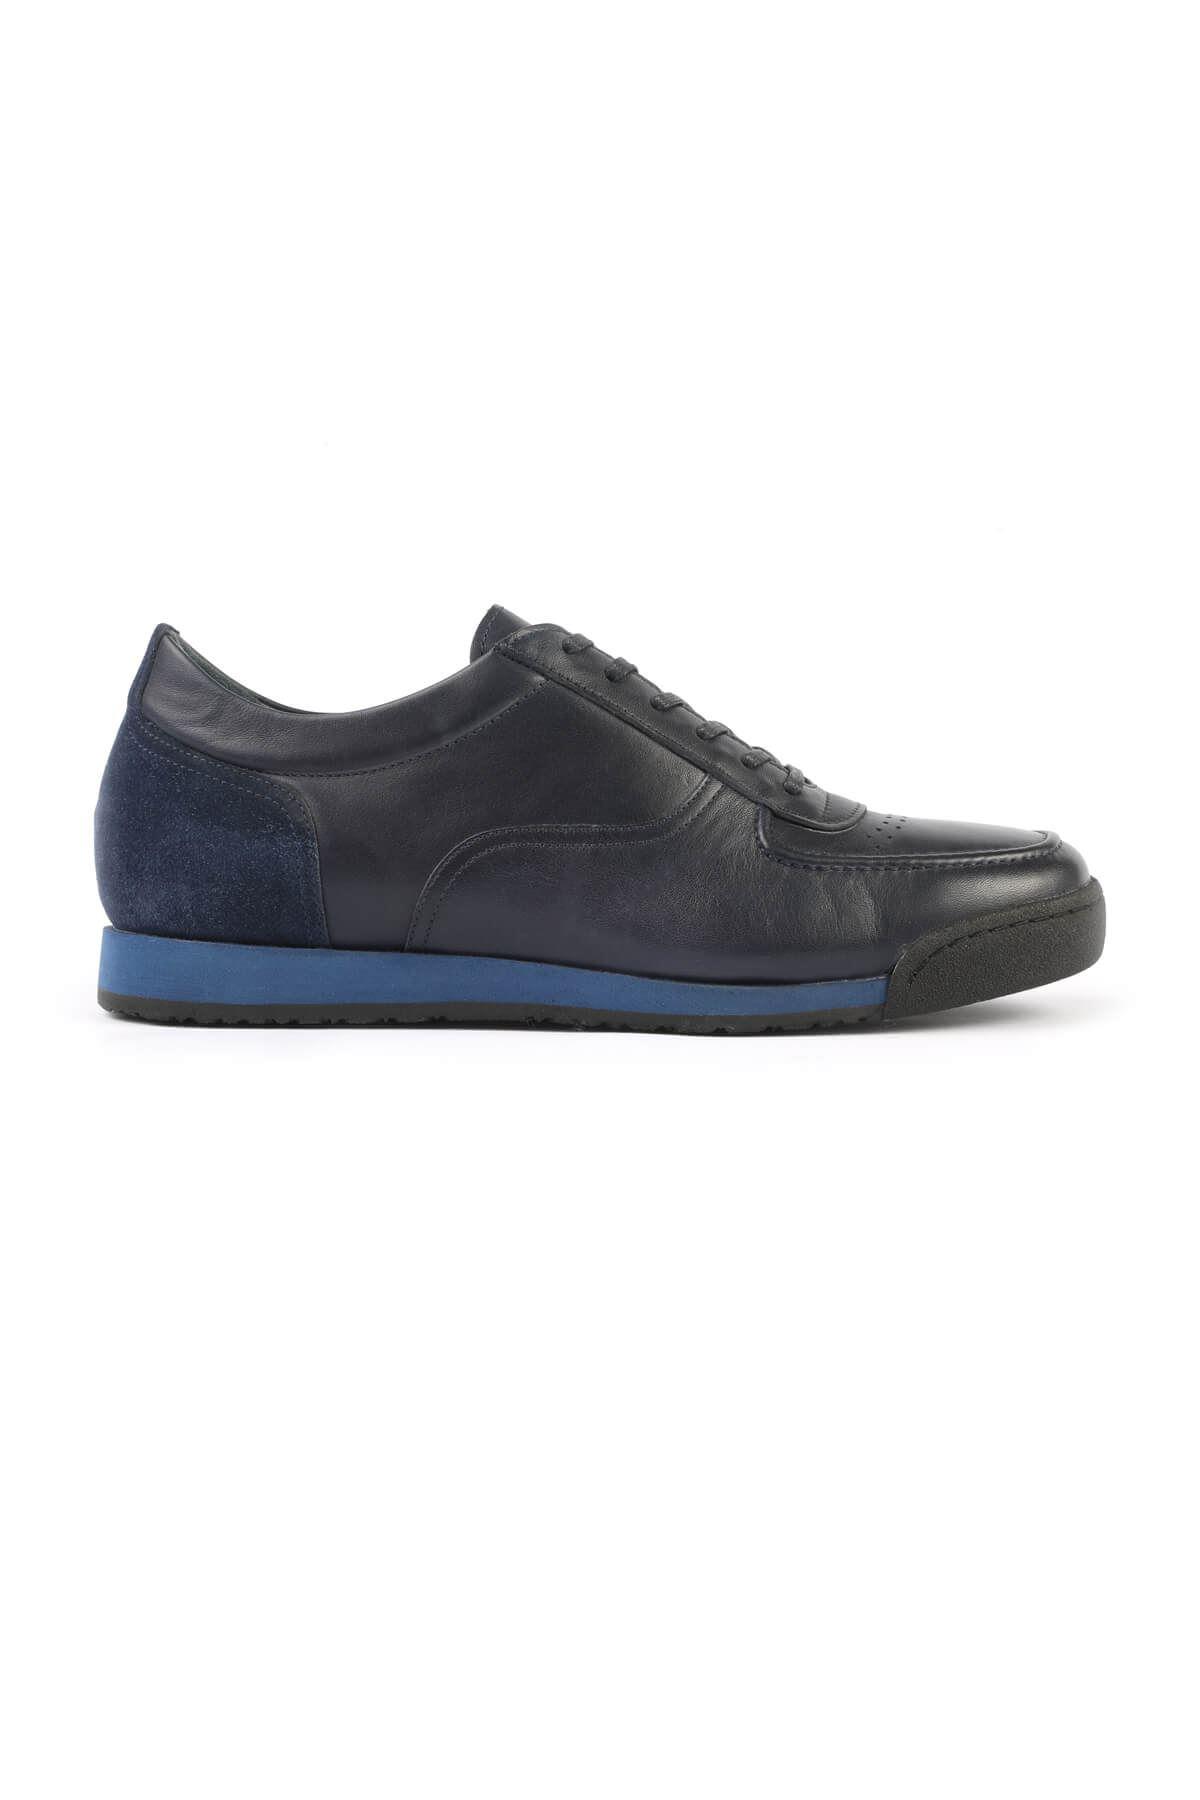 Libero 3001 Navy Blue Sport Shoes